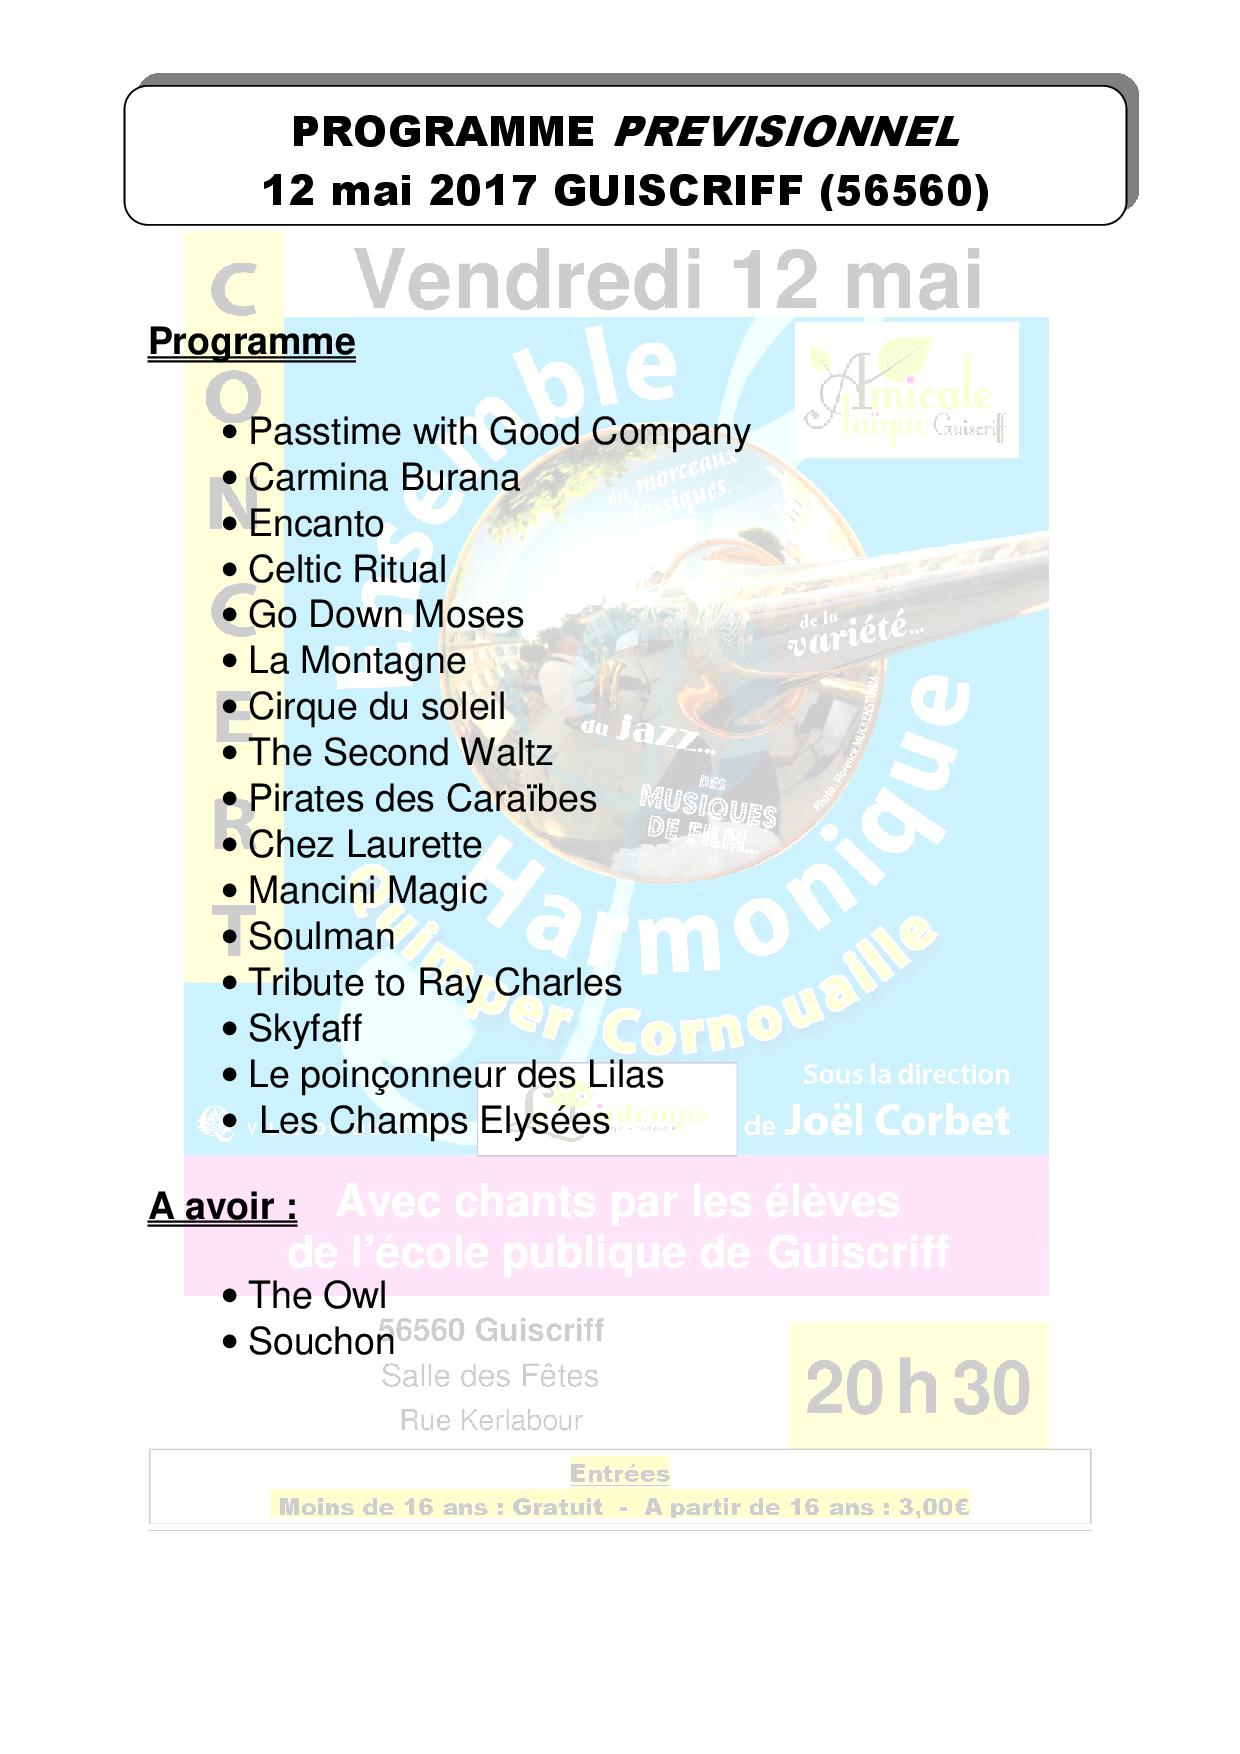 Programme concert Guiscriff 120517docx.jpg